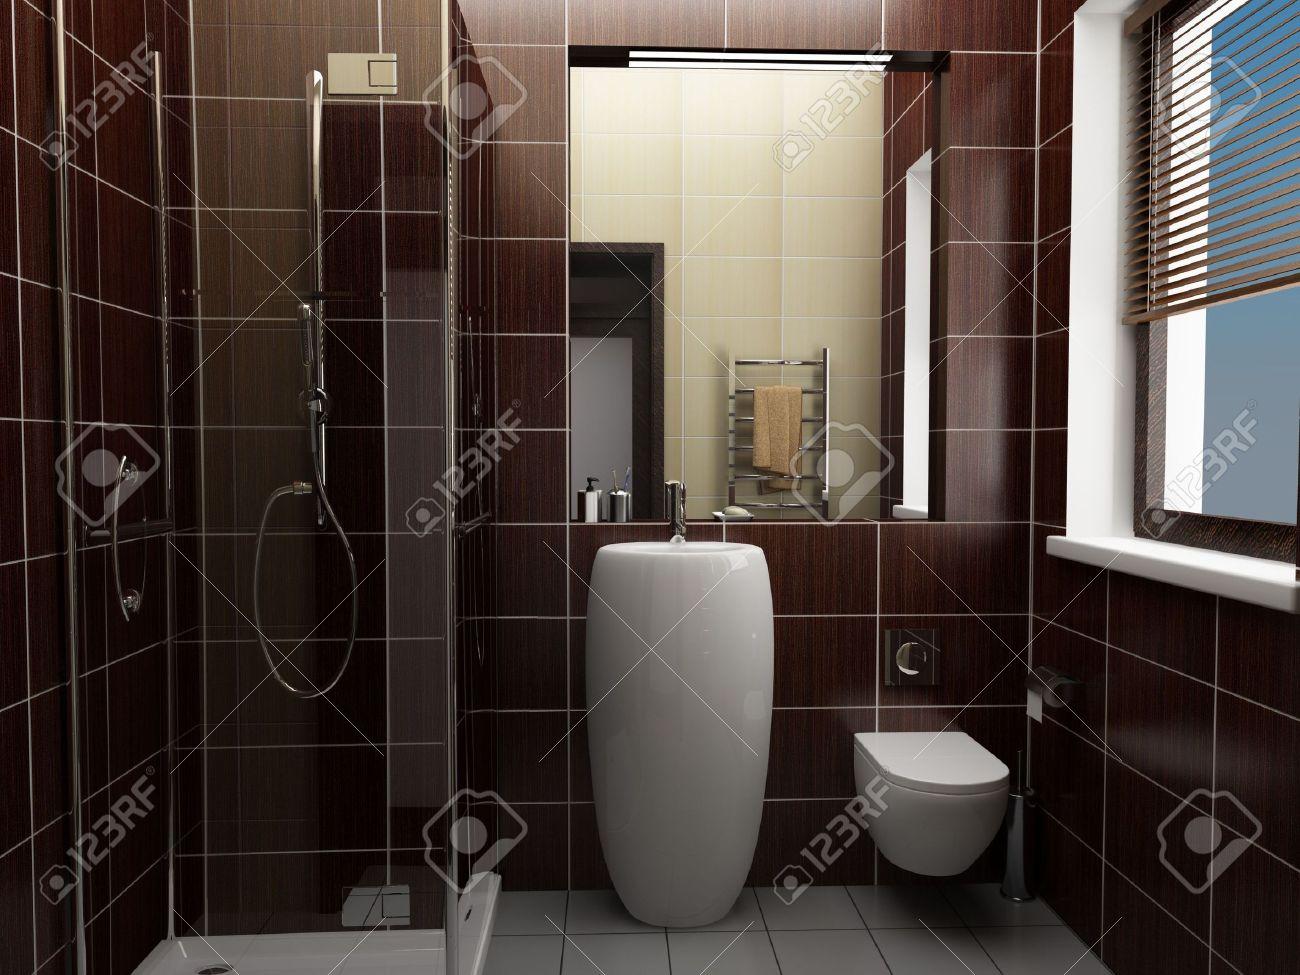 Piastrelle bagno marrone designer cheryl kees clendenon